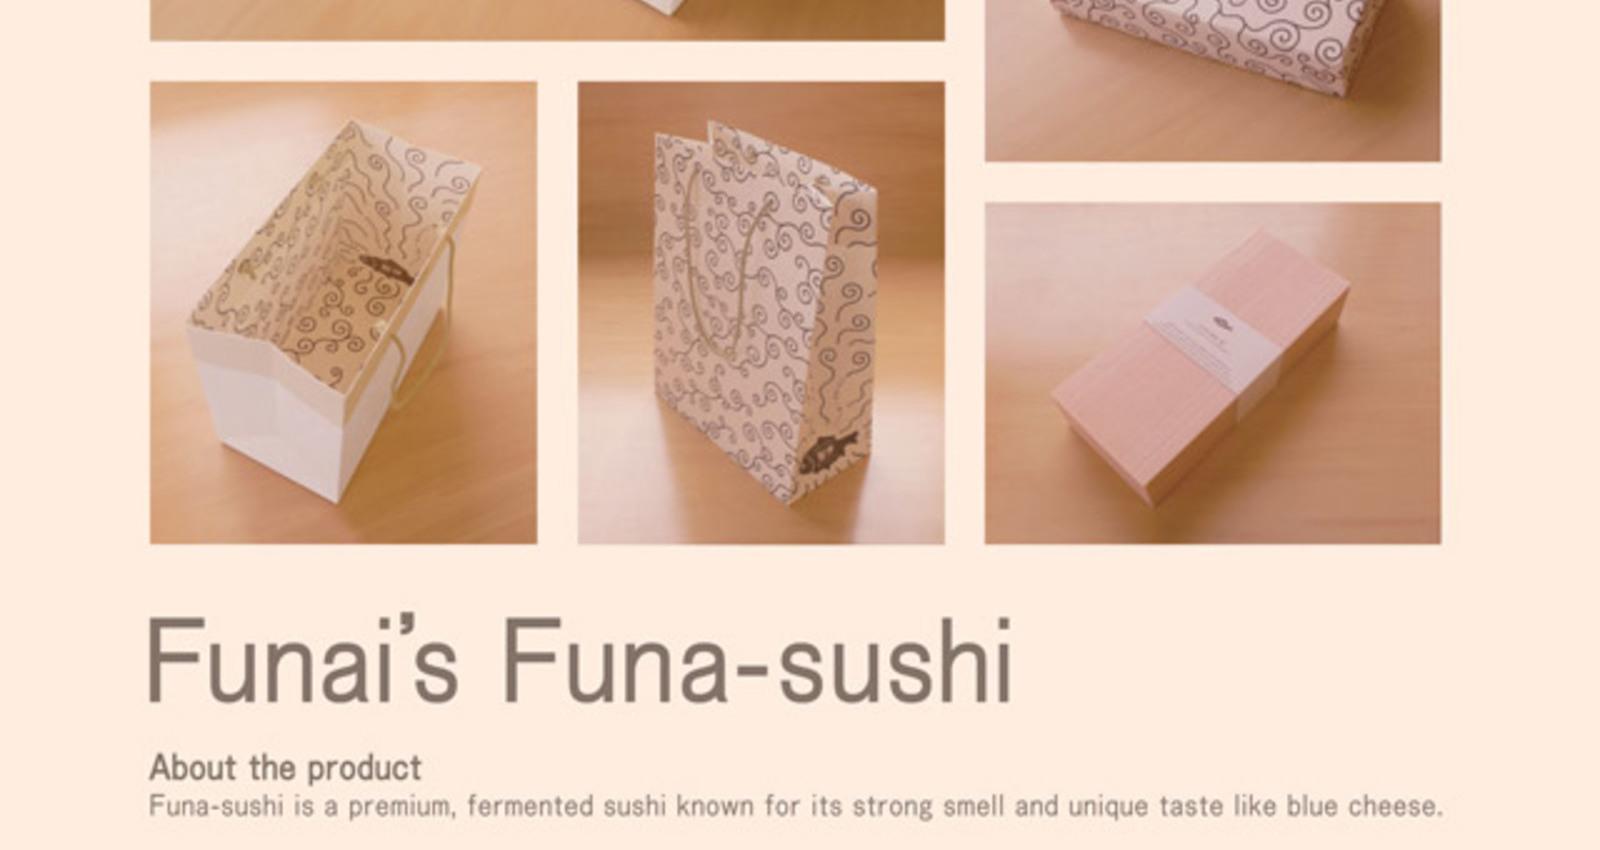 FUNAI'S FUNA SUSHI